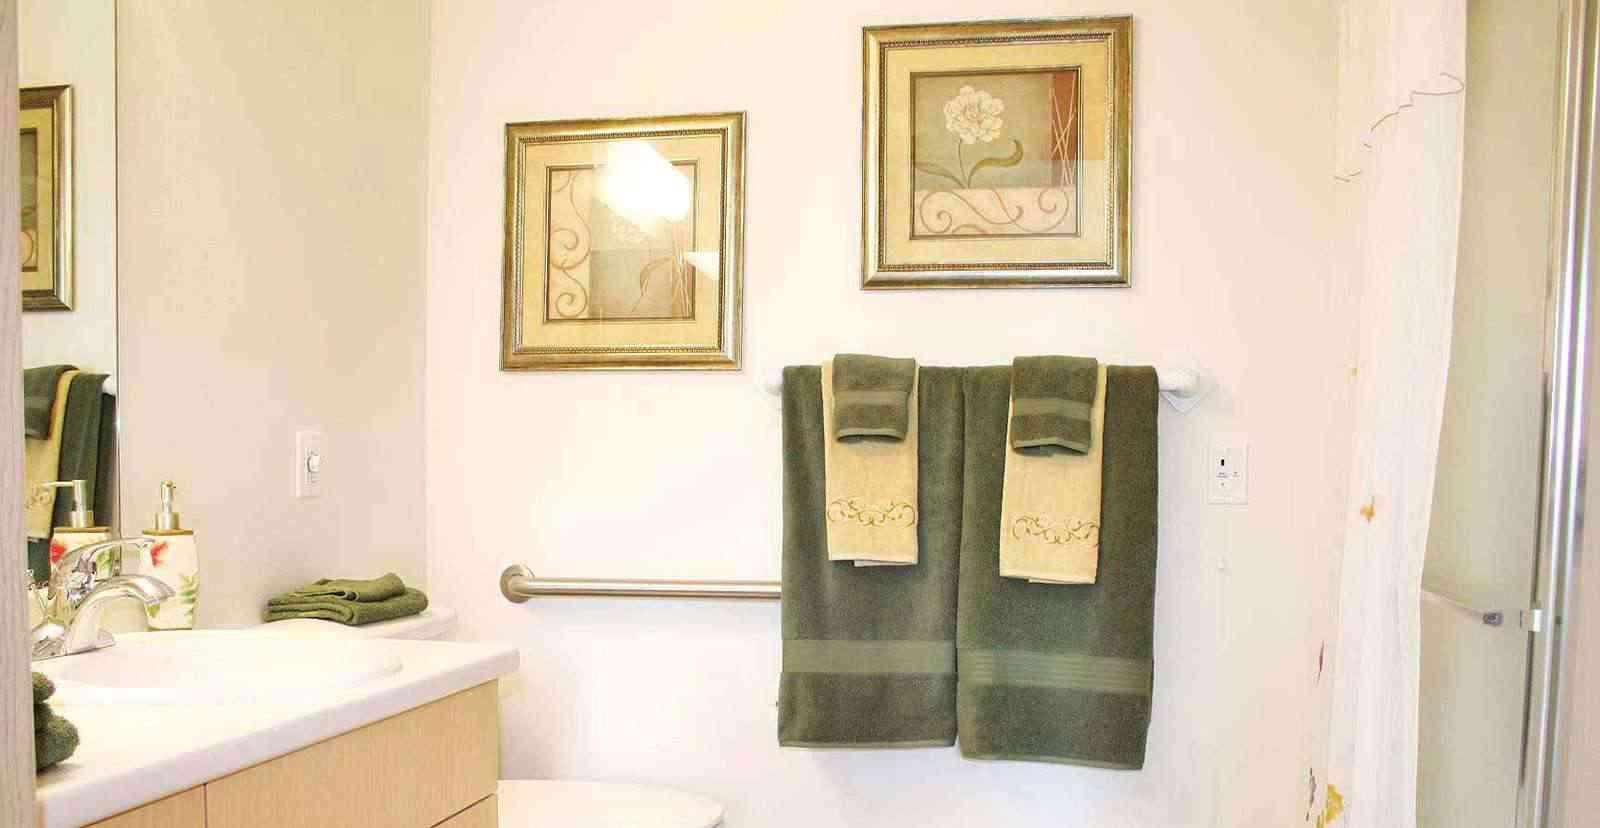 solstice-clovis-bathroom90be.jpg